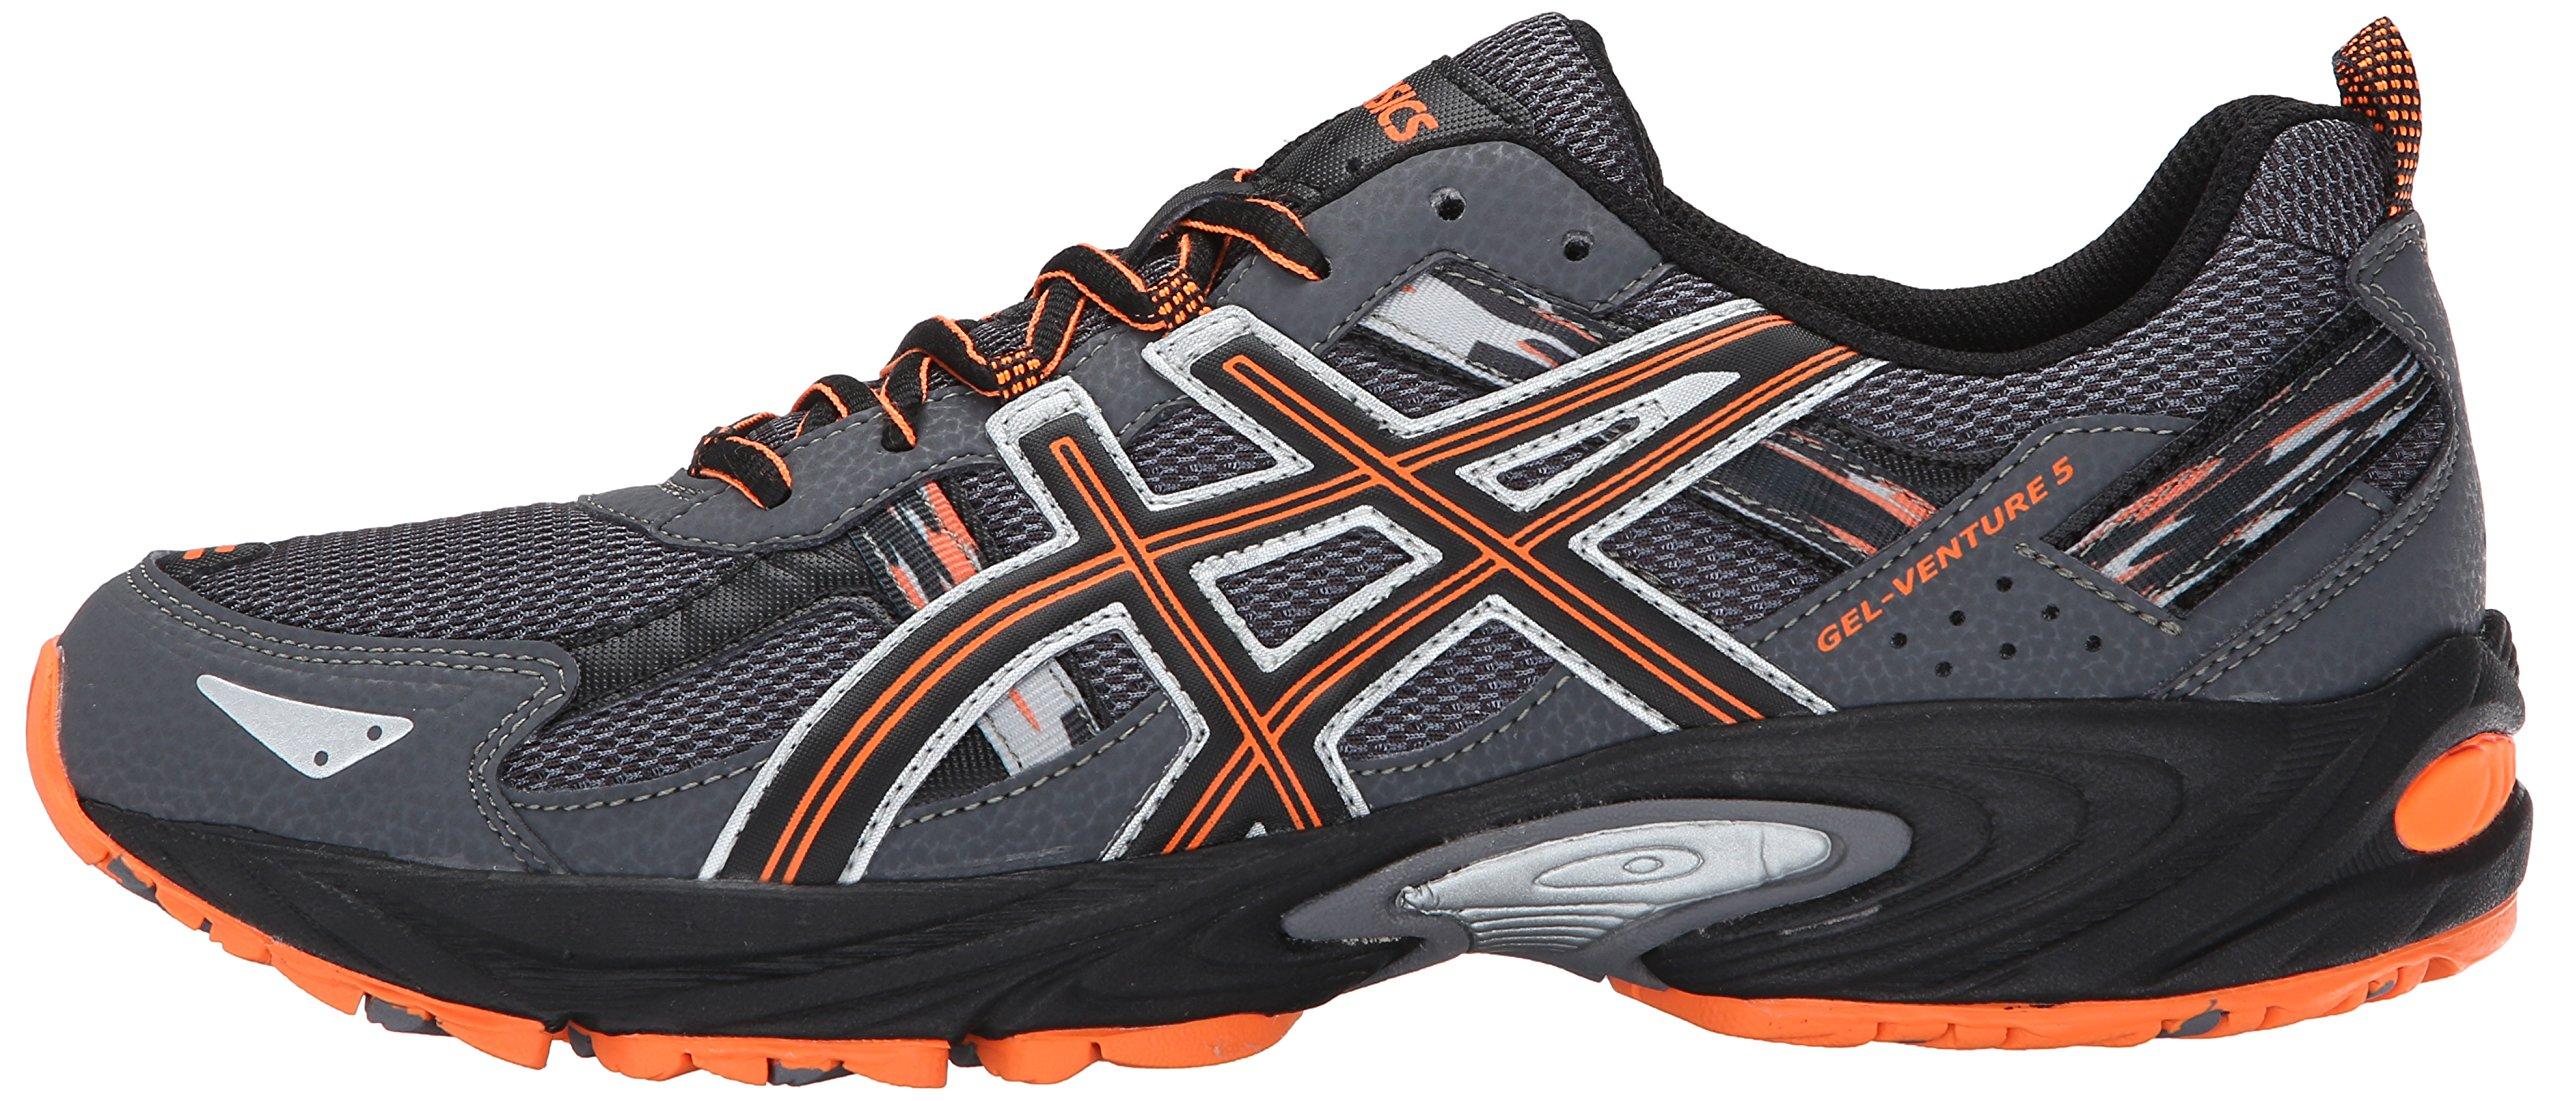 ASICS Men's Gel-Venture 5-M, Carbon/Black/Hot Orange 7.5 M US by ASICS (Image #5)